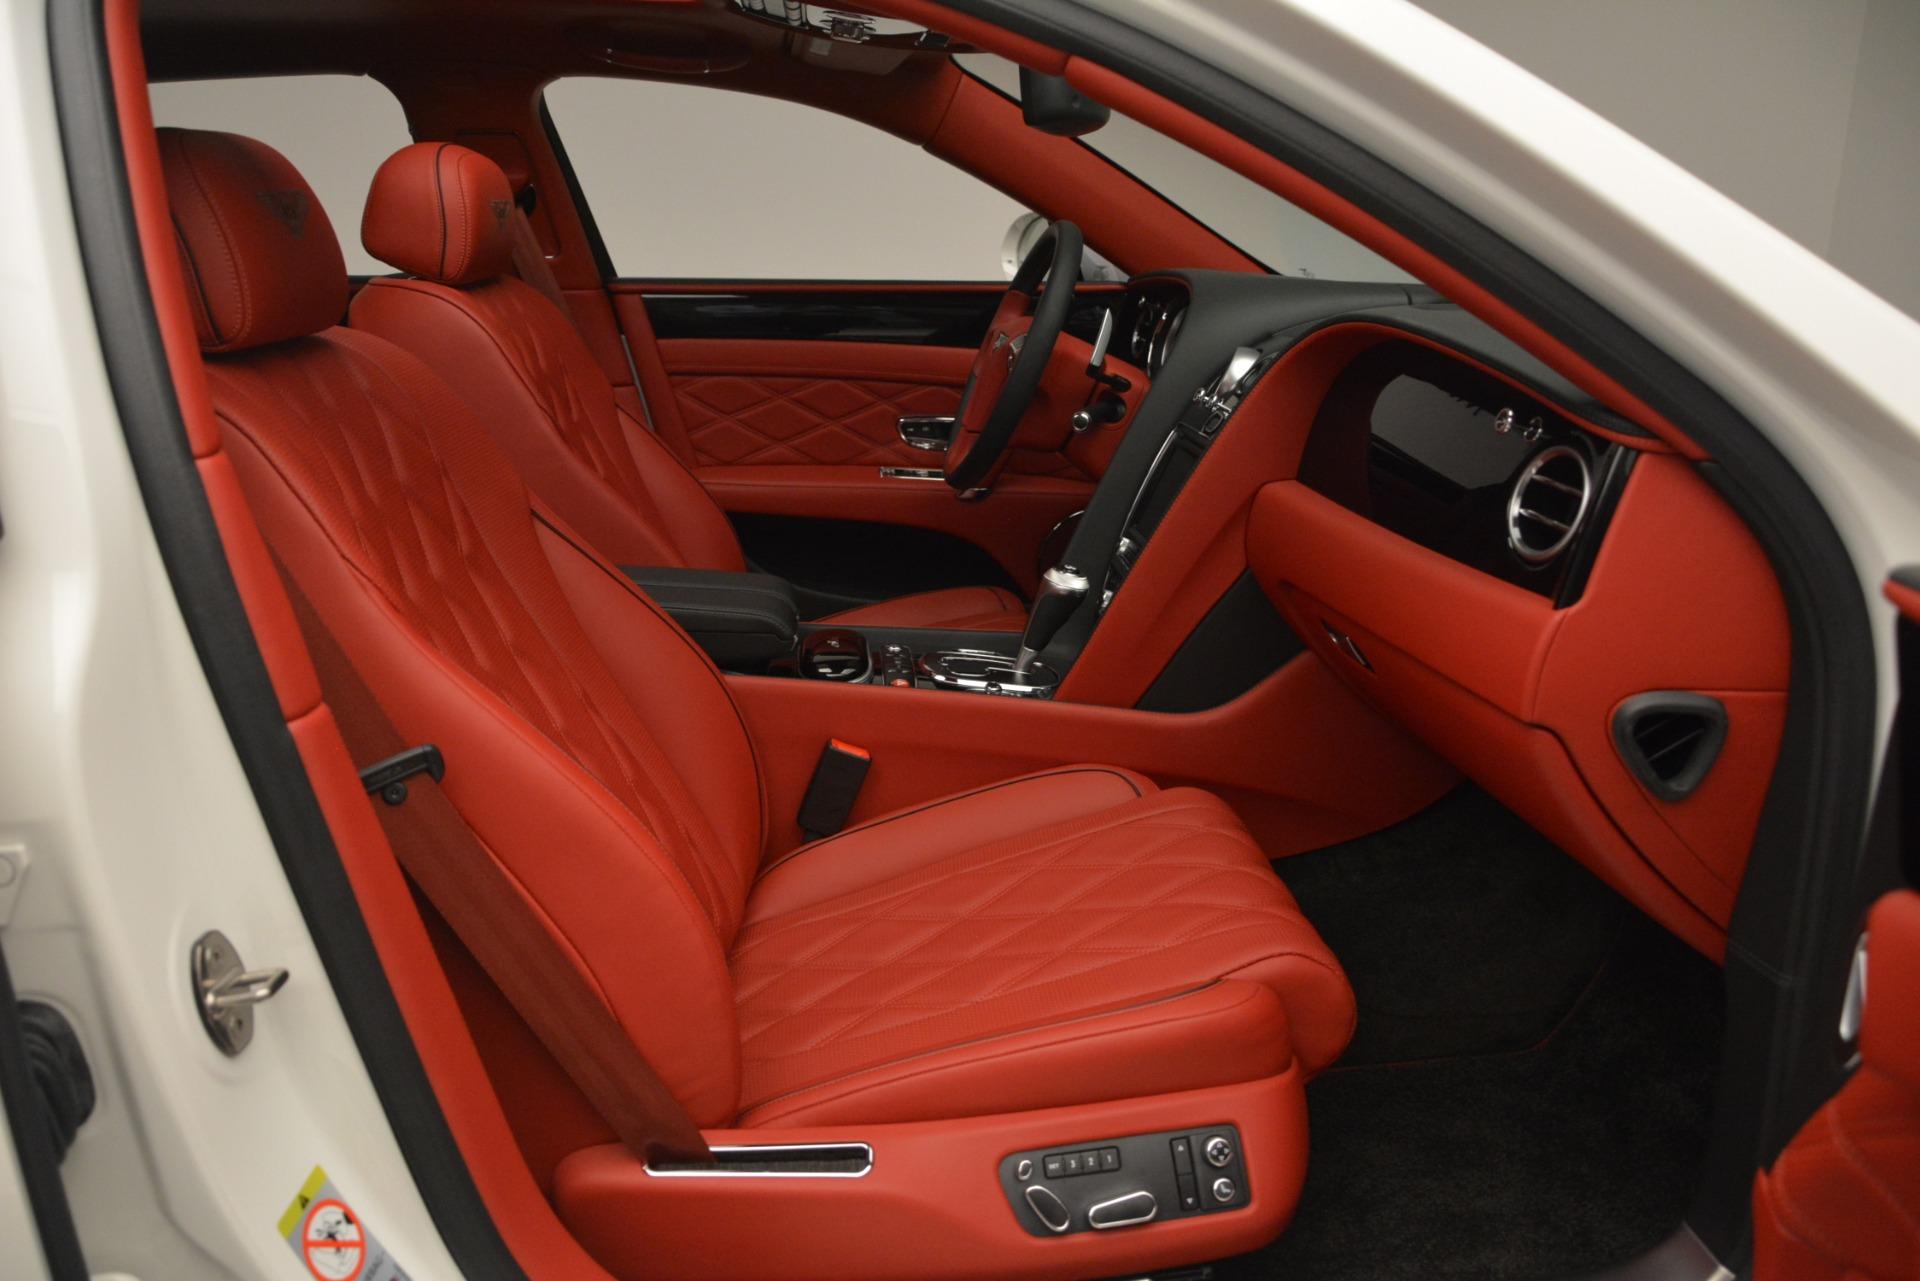 Used 2016 Bentley Flying Spur V8 For Sale In Westport, CT 3265_p30